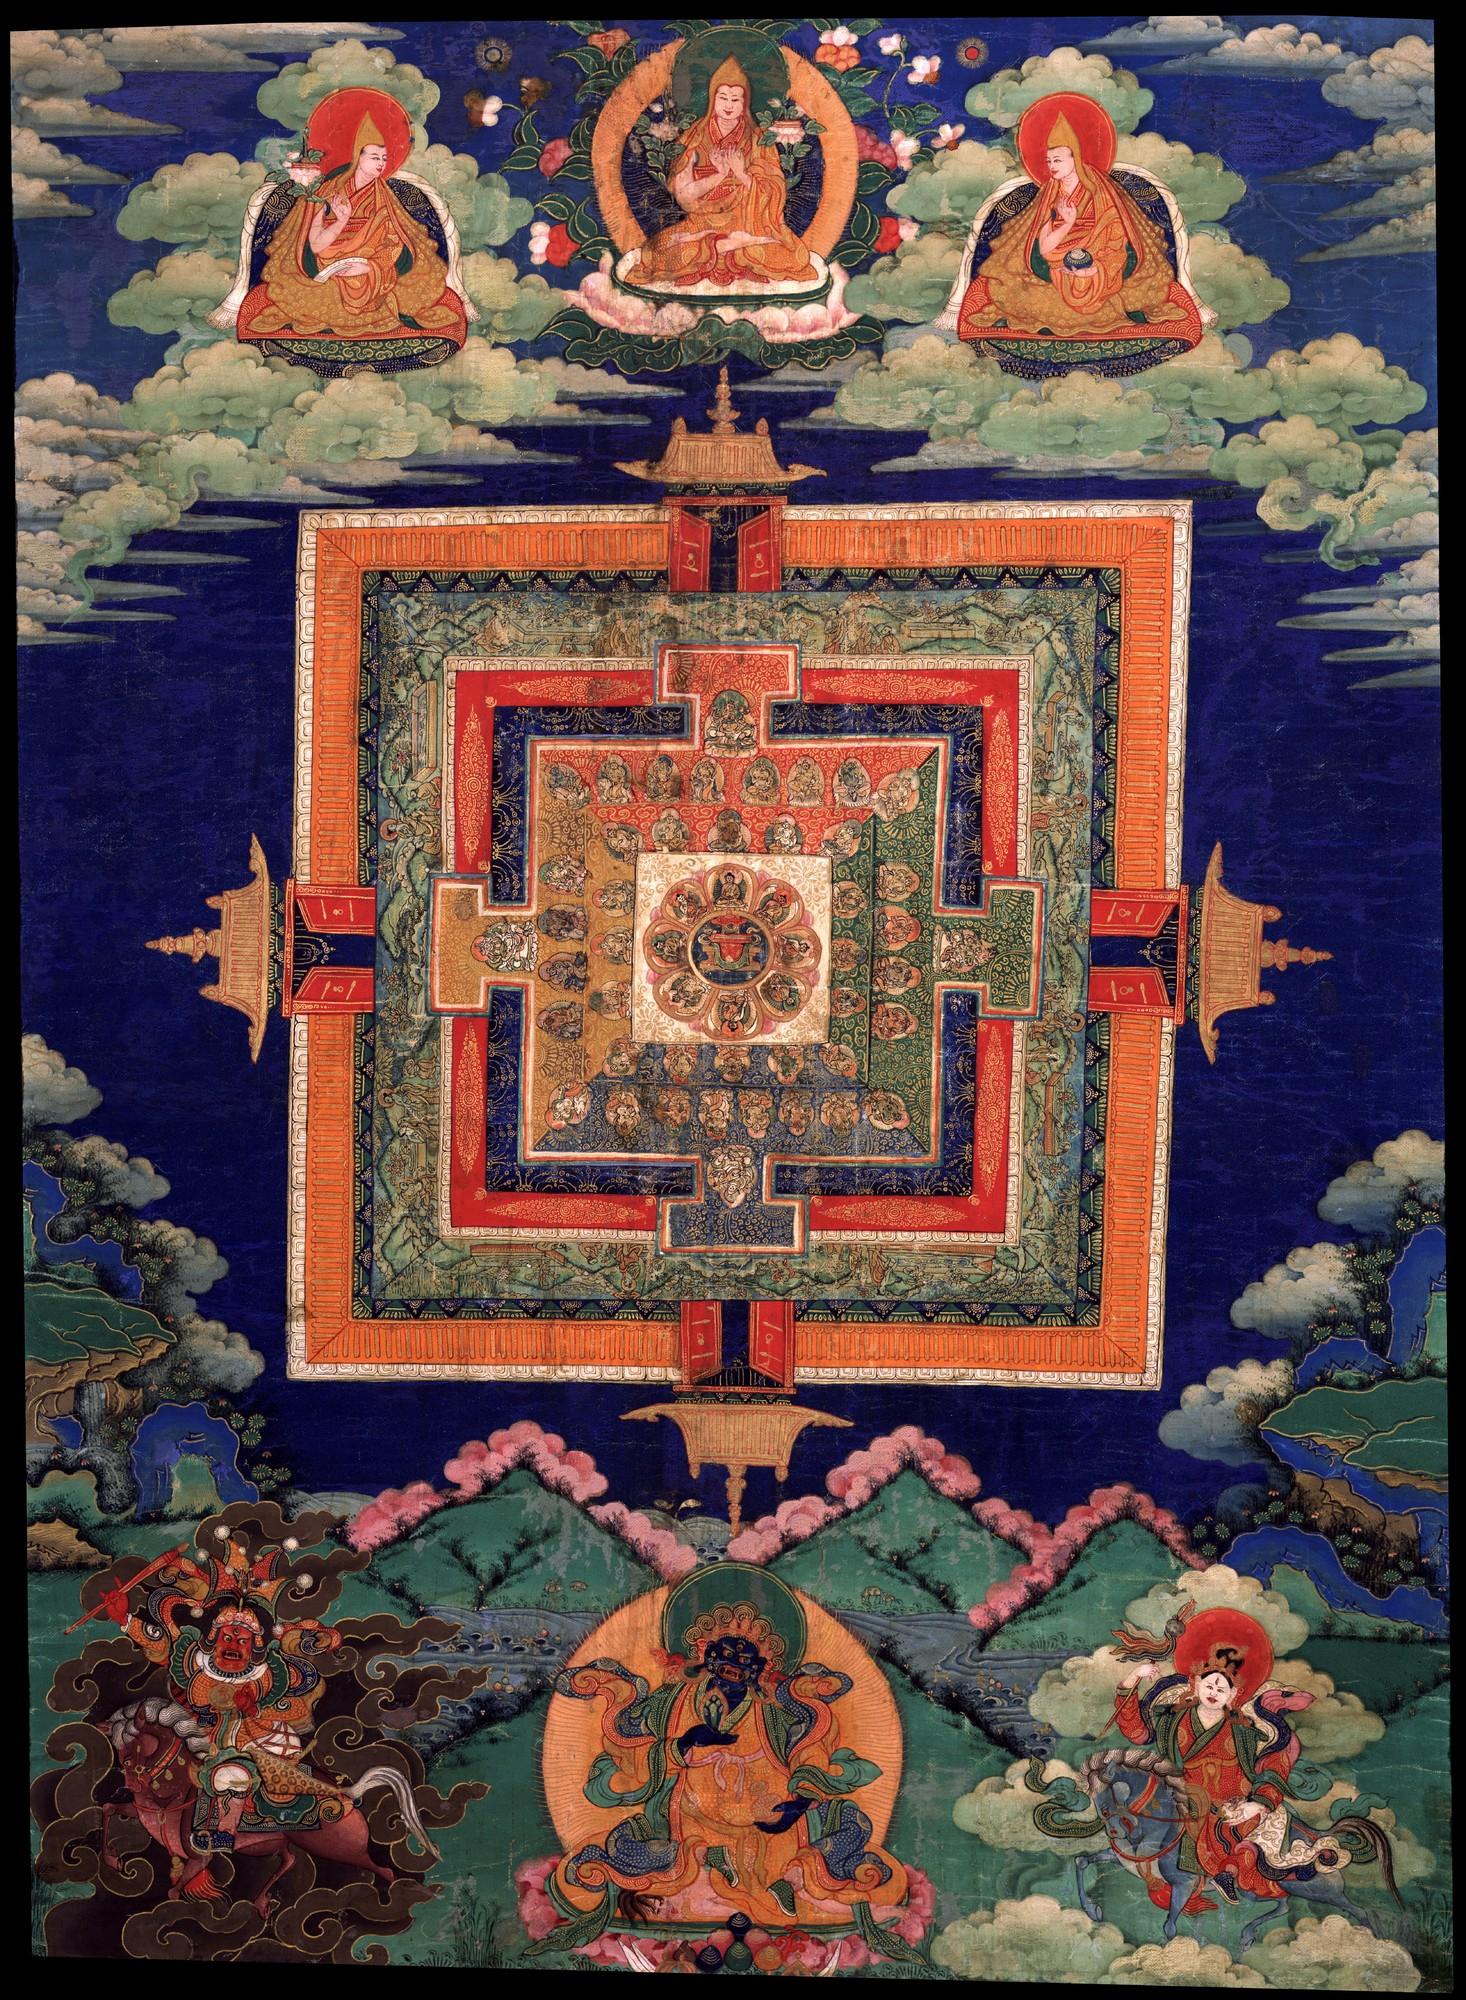 Hiking with the Medicine Buddha - Ep. 232 of the Bob Thurman Podcast Image of the Medicine Buddha Mandala via www. himalayaart.com.